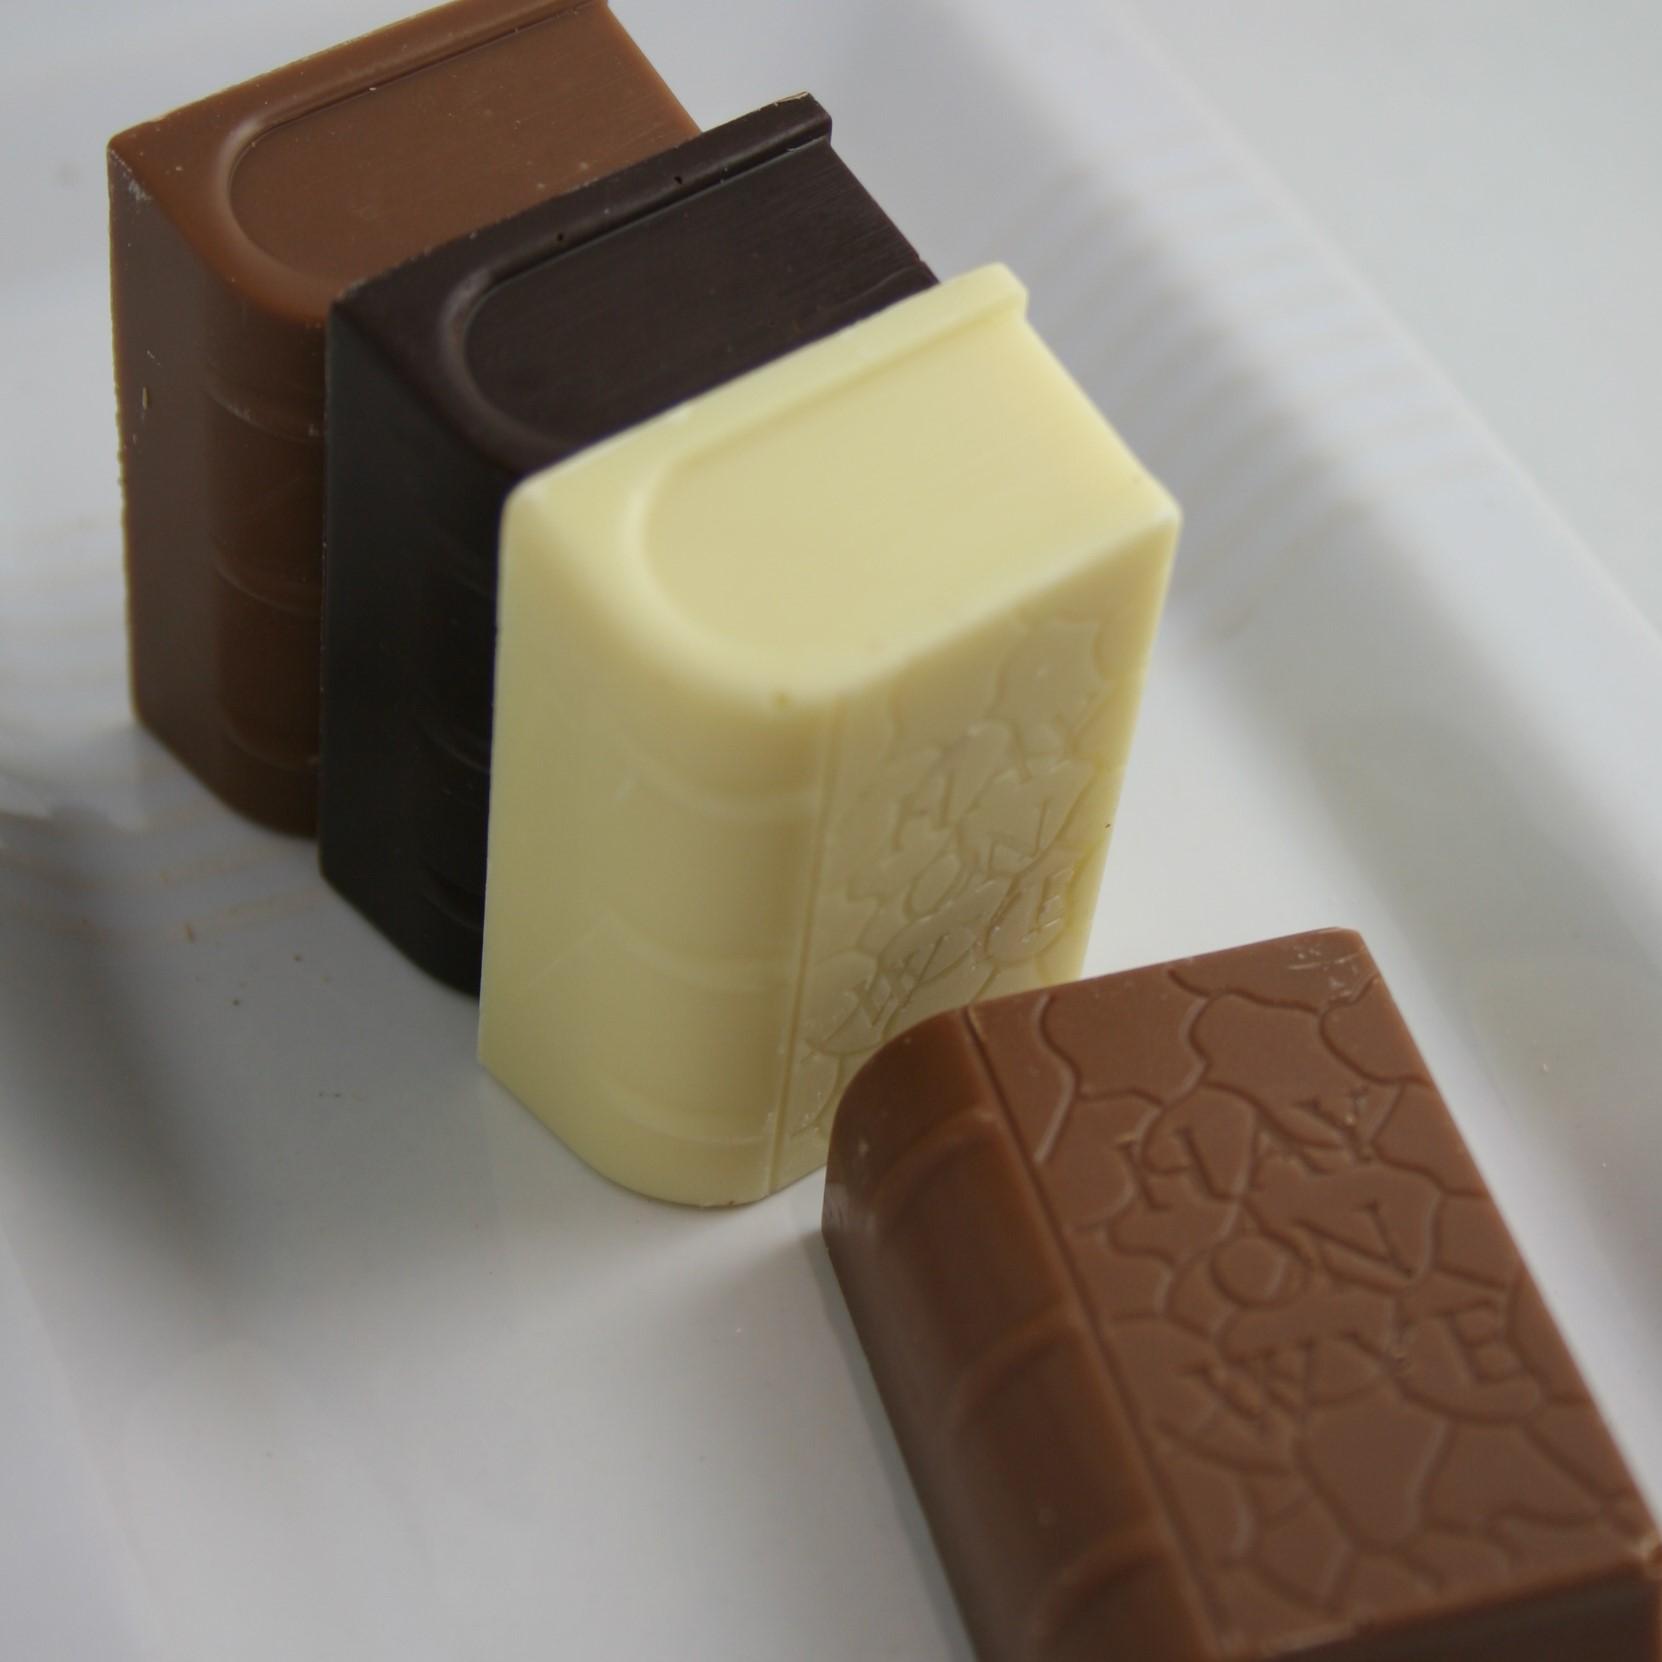 Mini Book Pack. 4 different Solid Chocolate Mini Books.